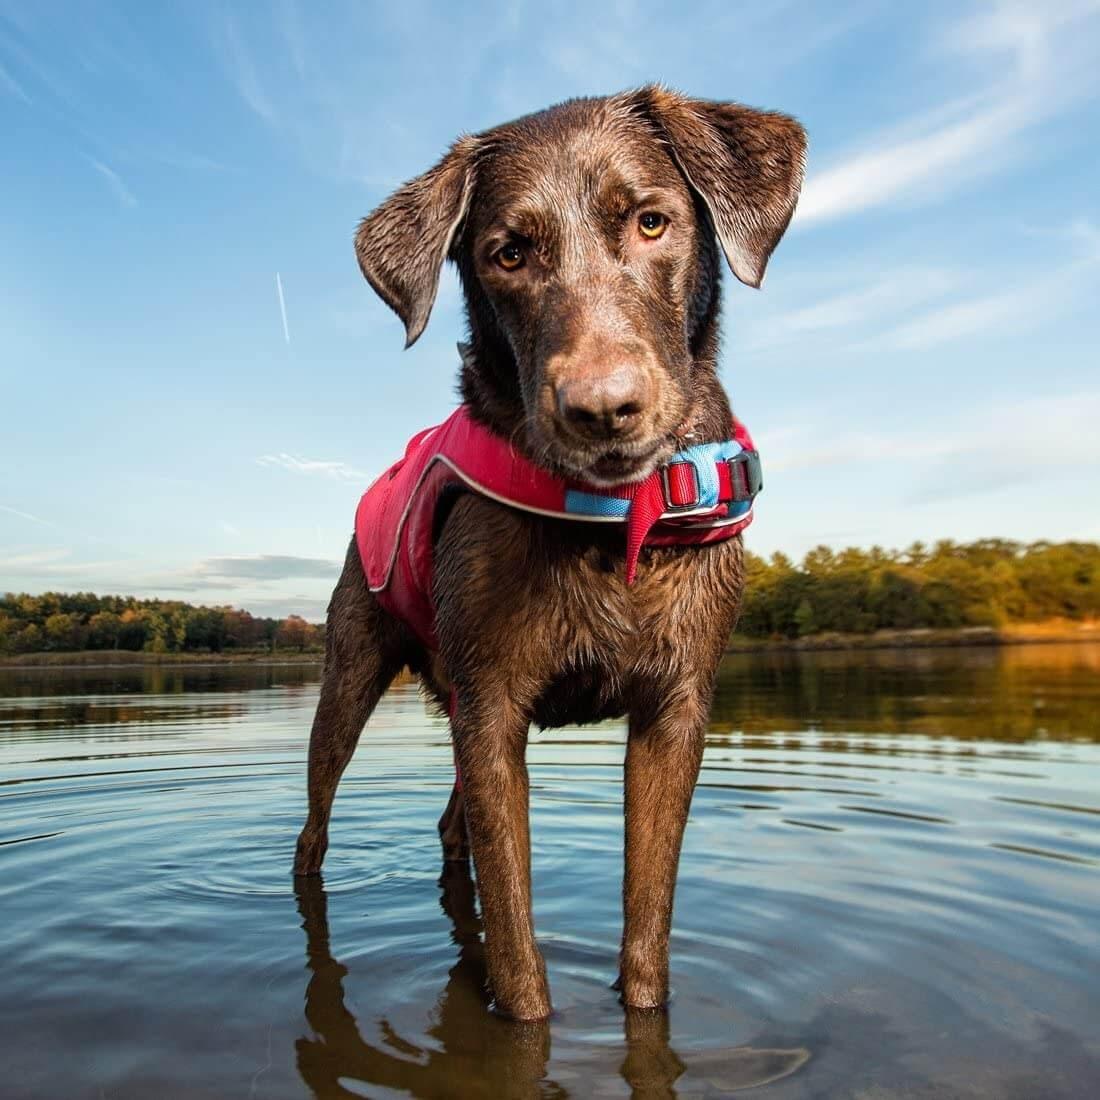 Kurgo Surf N Turf Dog Life Jacket